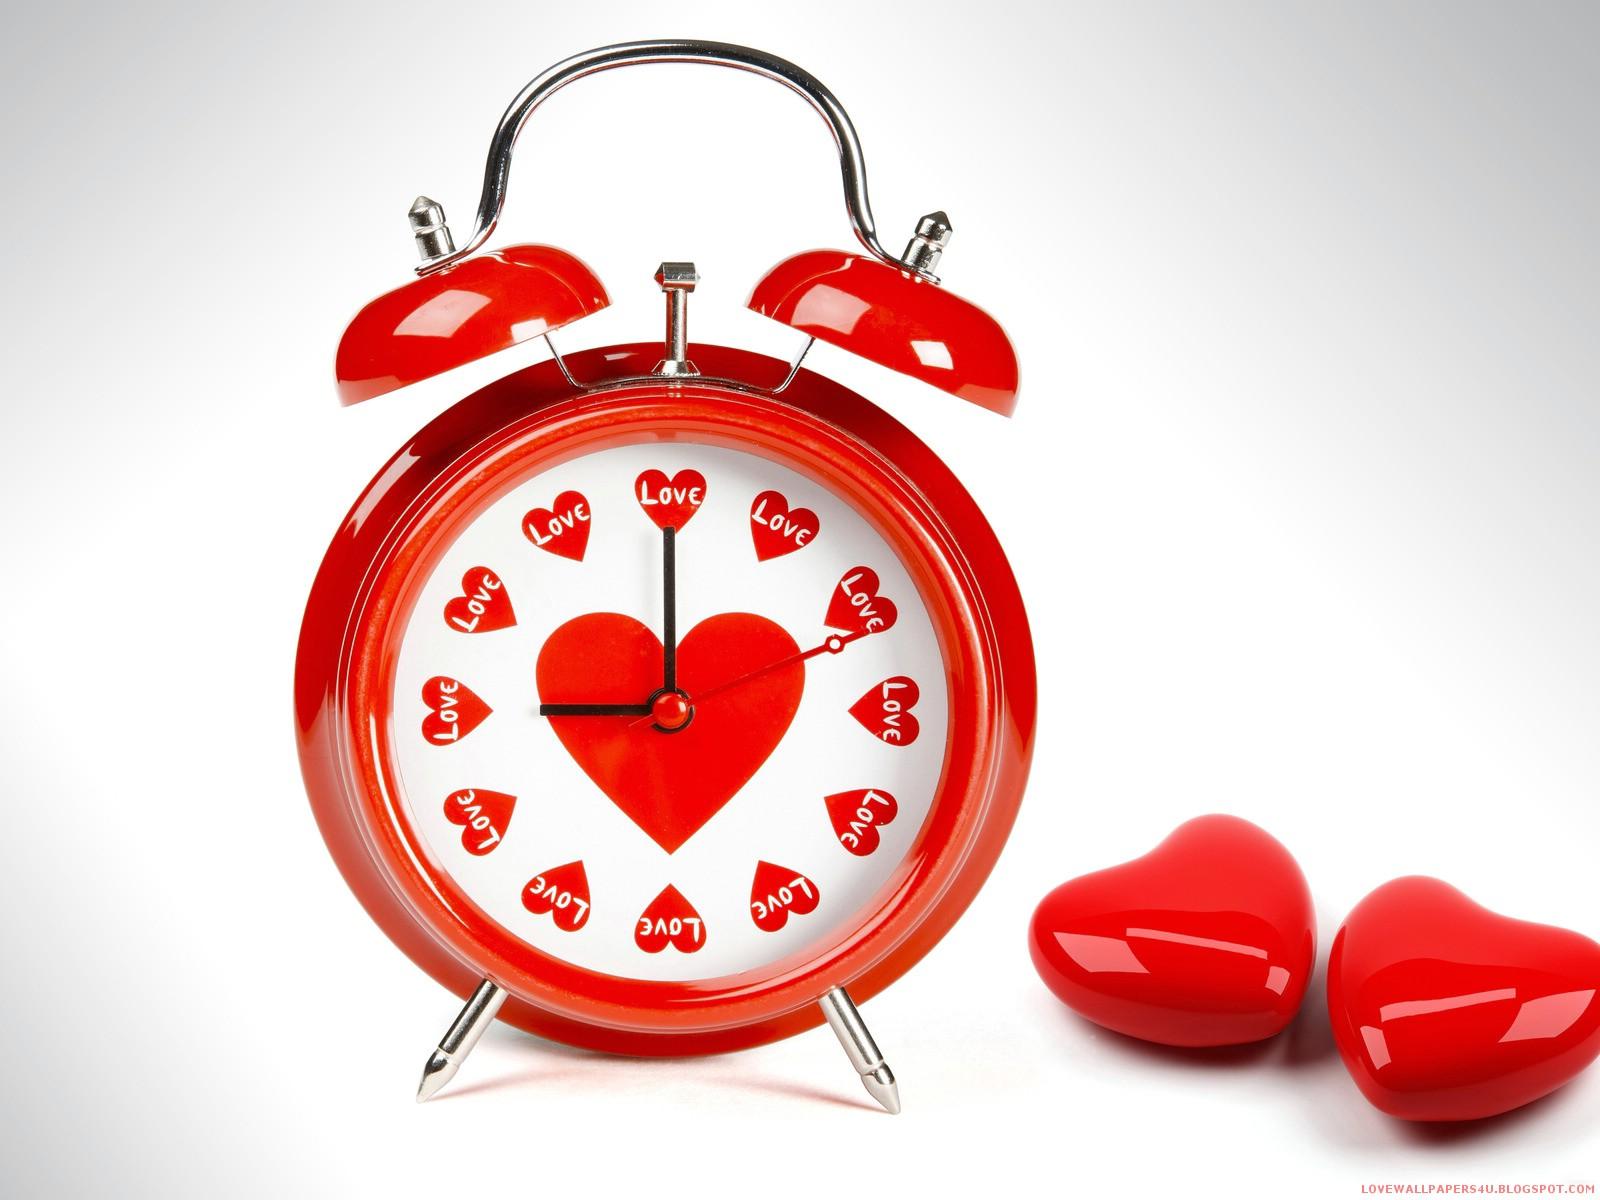 http://1.bp.blogspot.com/-ahioU0XEZZE/TZkYbuufskI/AAAAAAAAAfY/JSXSKoqN6so/s1600/love-clock.jpg